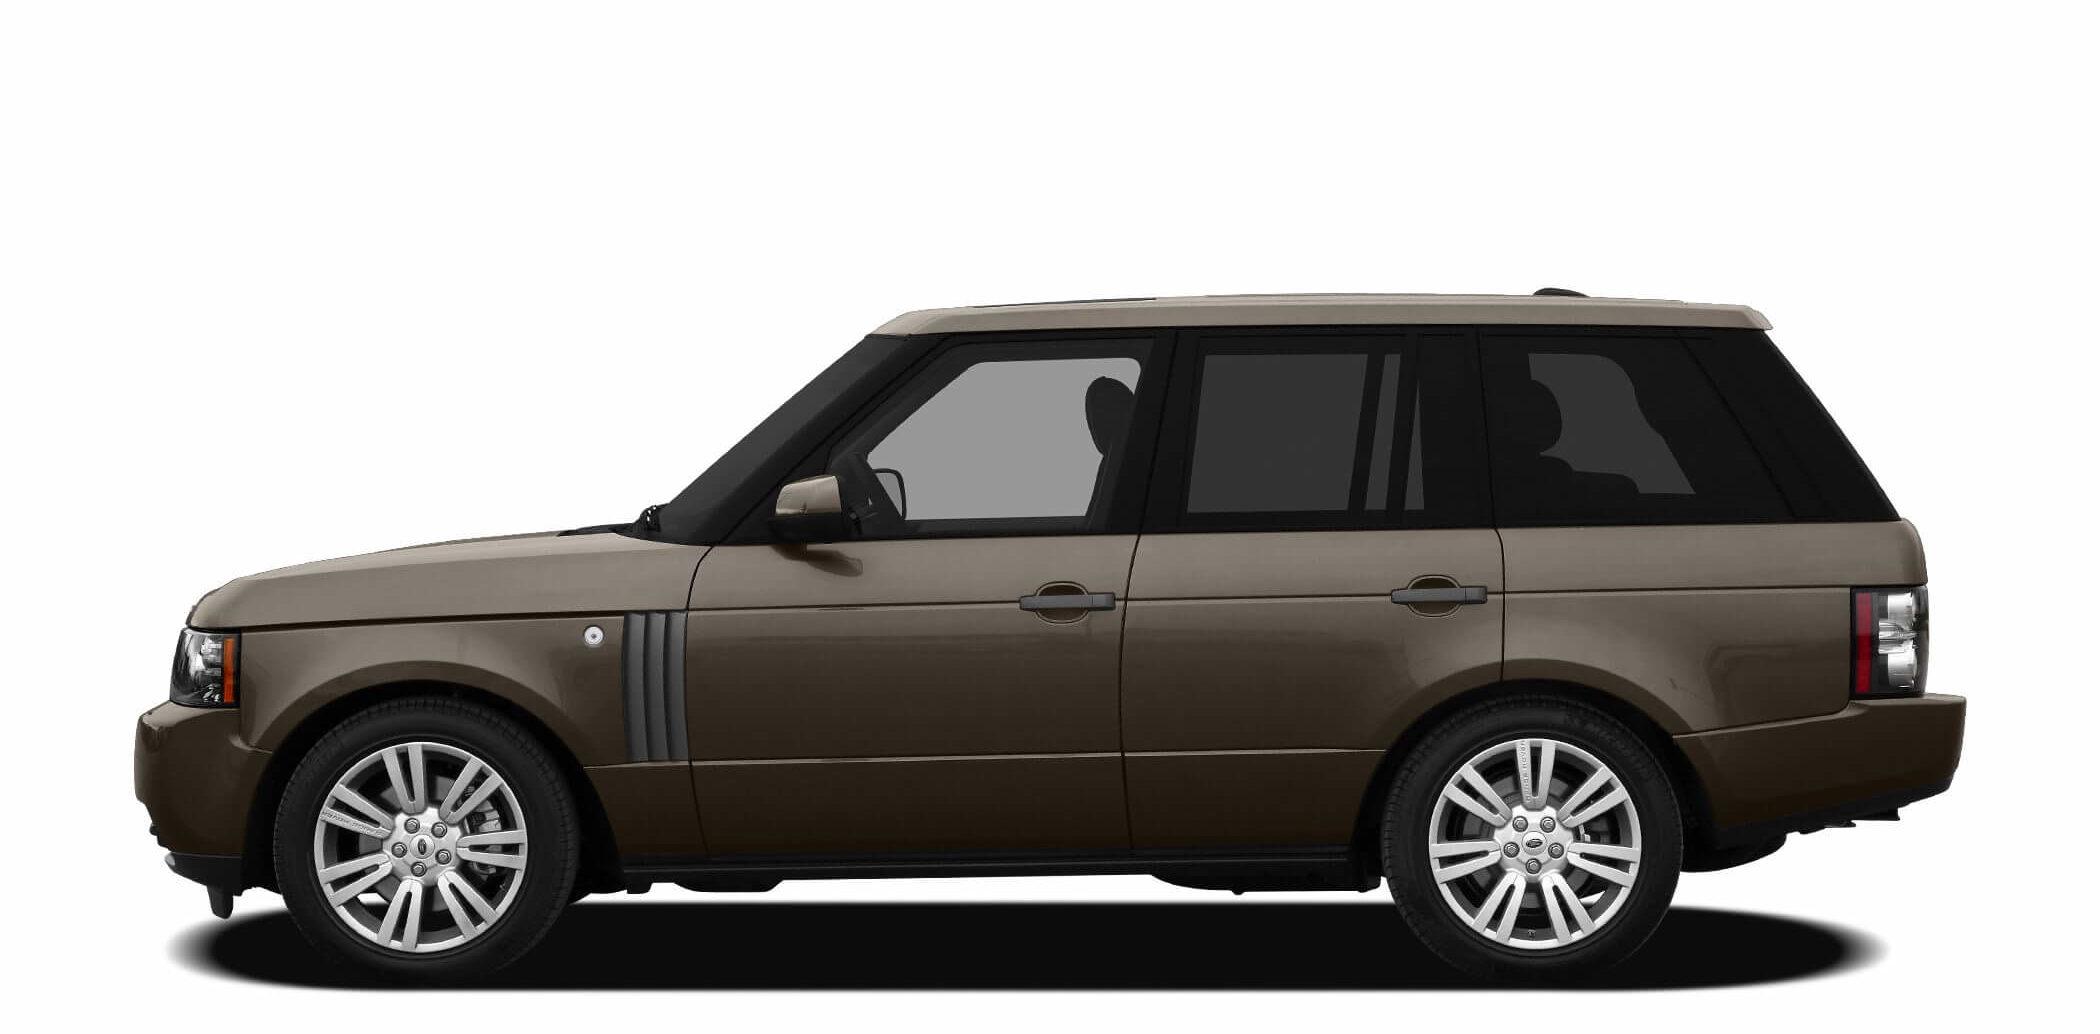 Ремонт бампер Range Rover Vogue